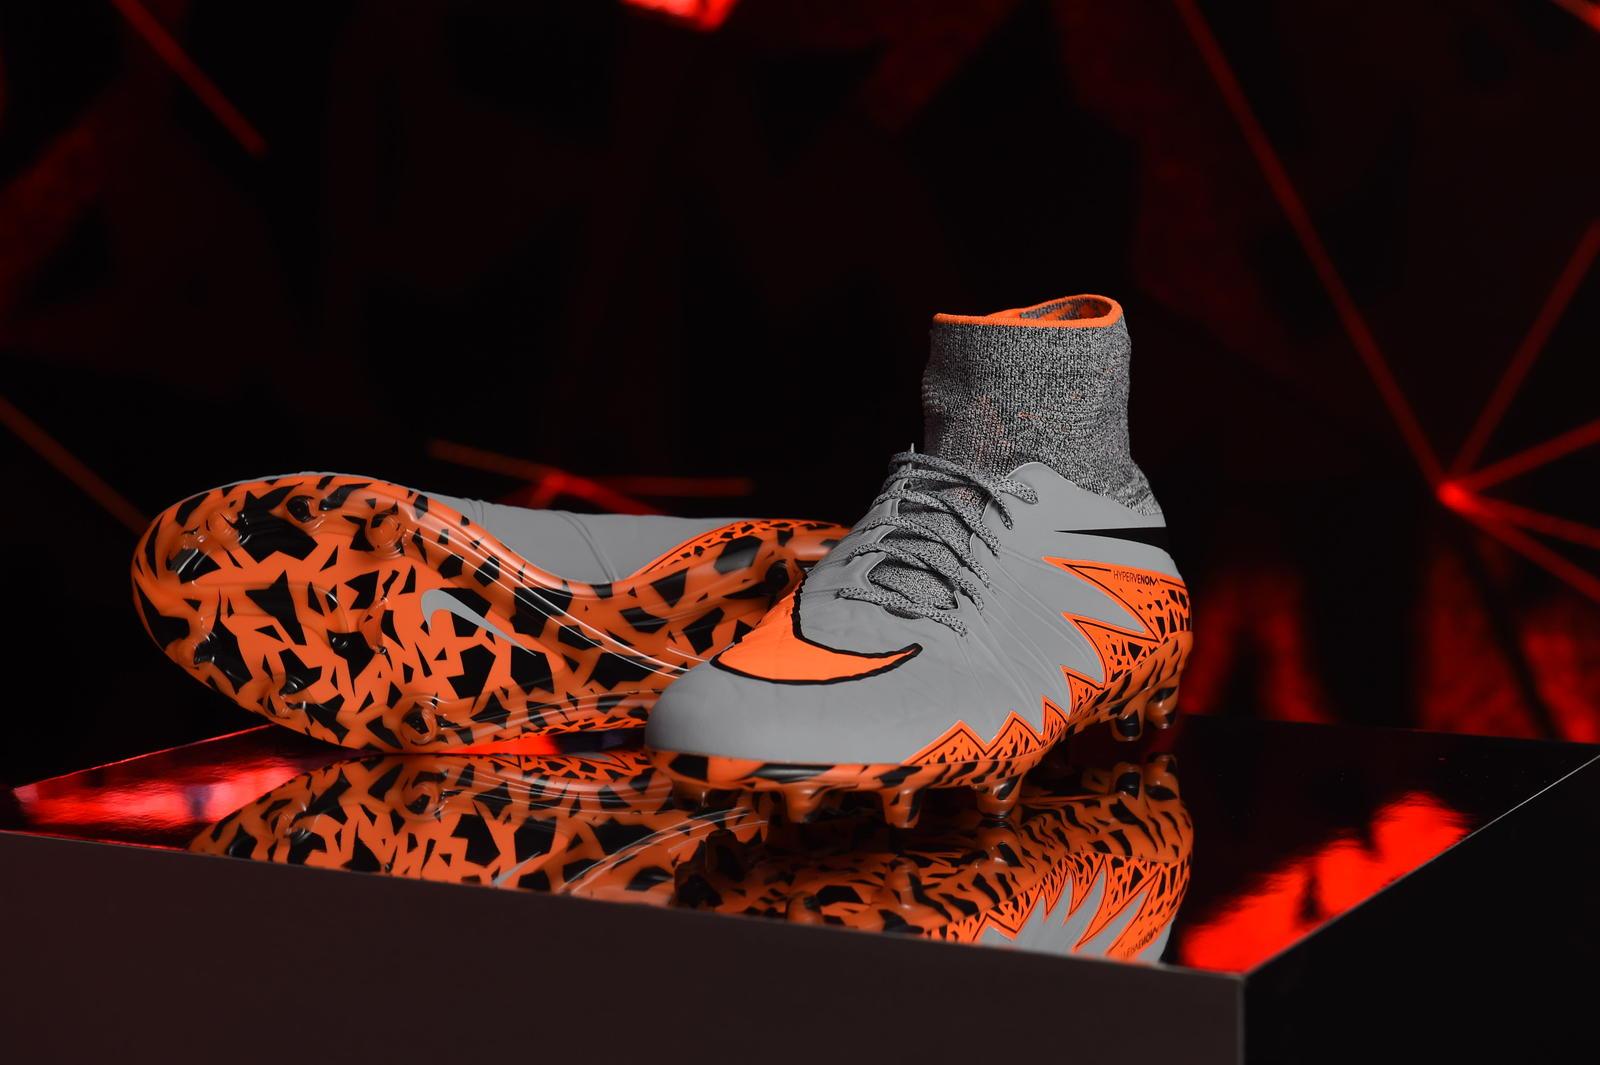 Introducing the Nike Hypervenom II